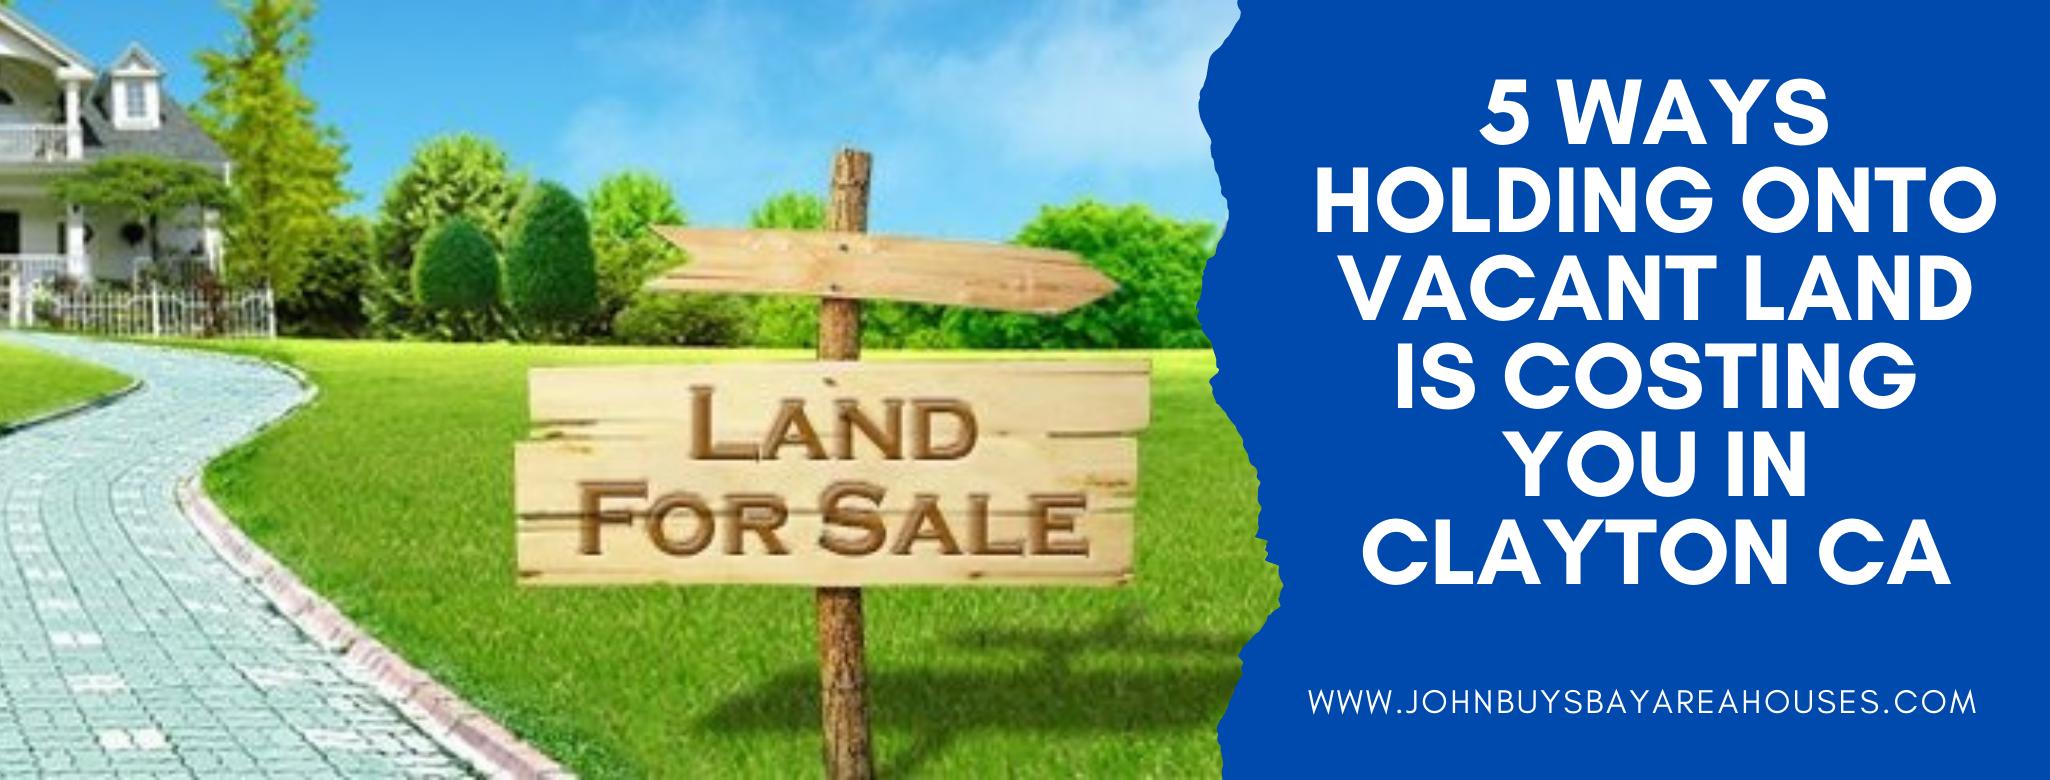 We buy properties in Clayton CA